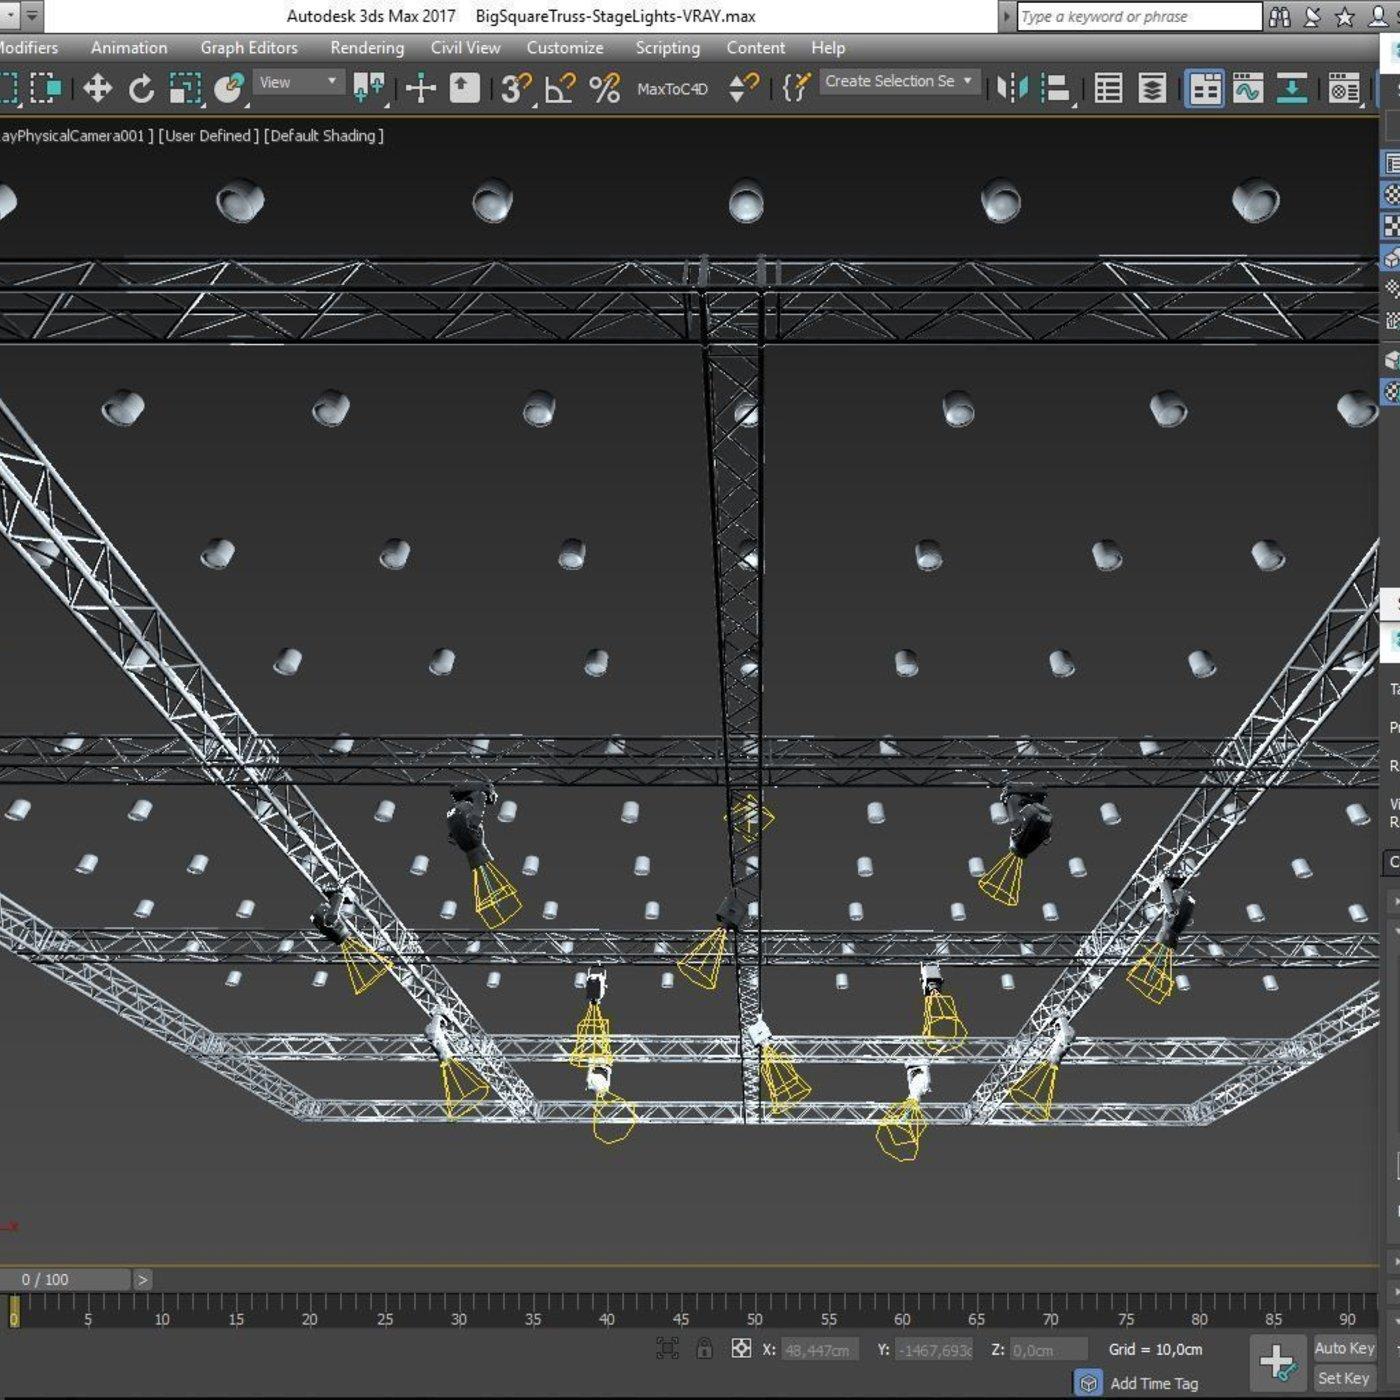 Big Square Truss-Stage Lights